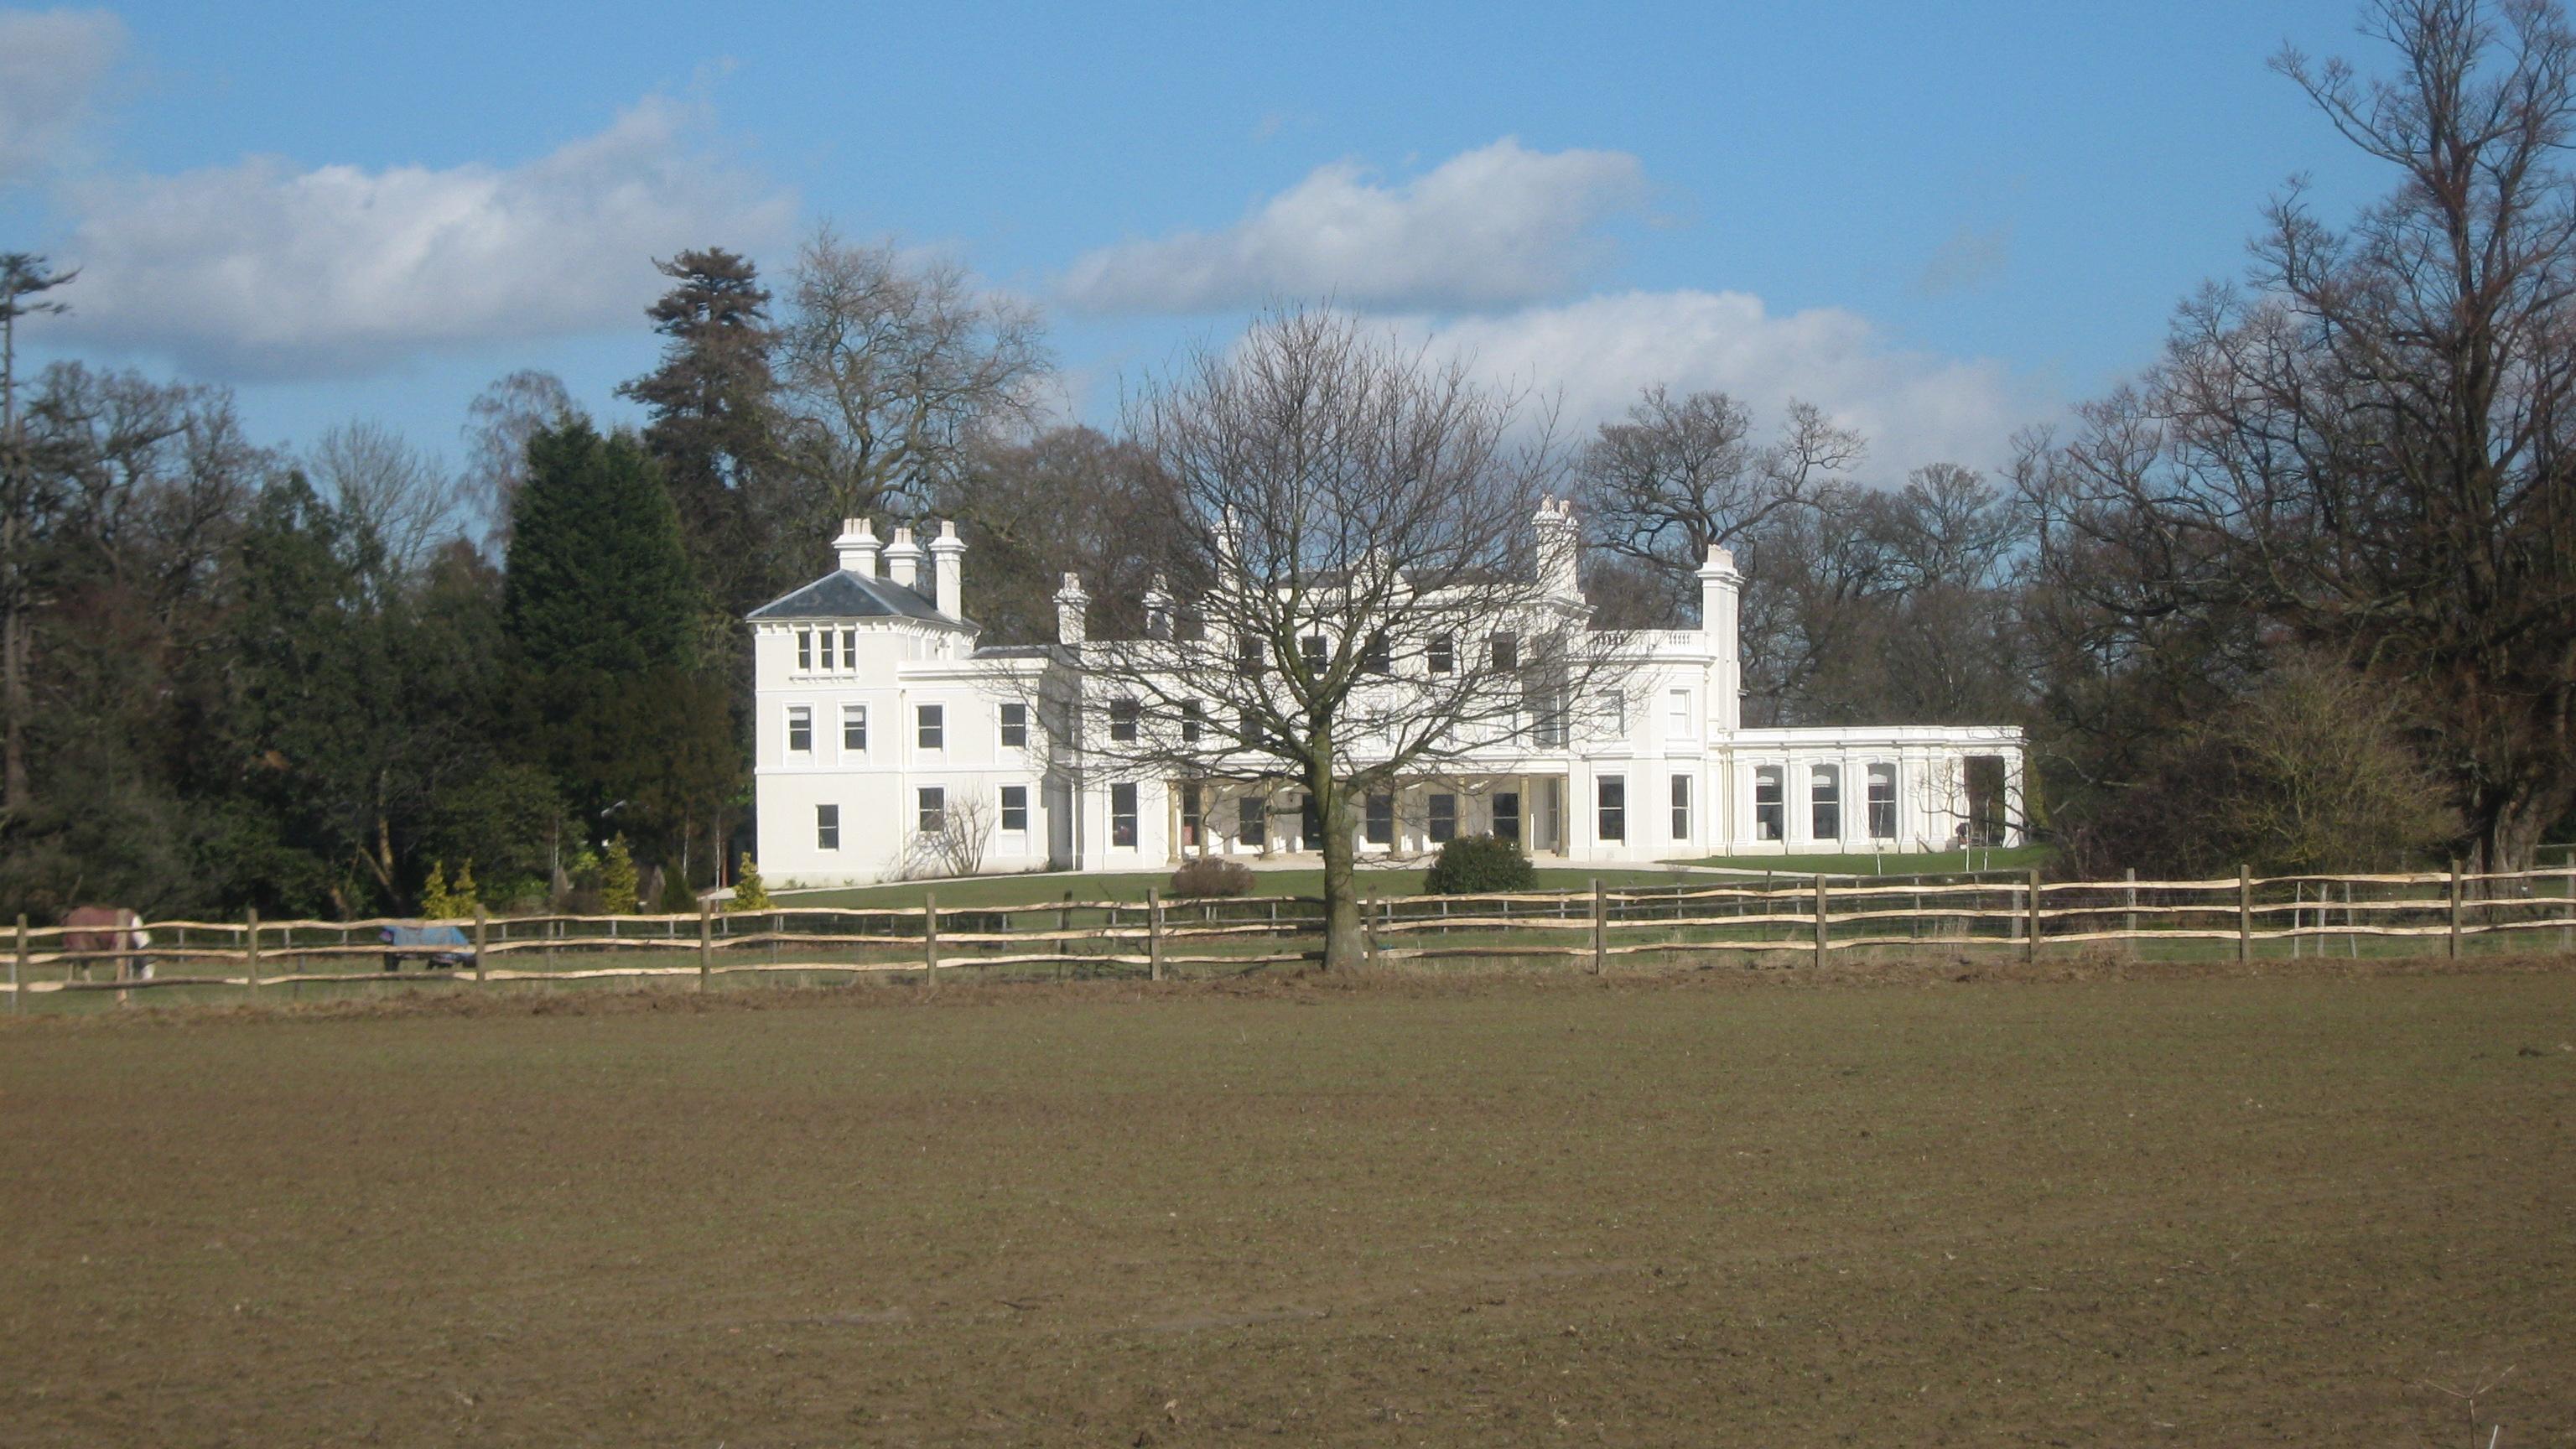 File:Ashurst Manor (3) - geograph org uk - 1735348 jpg